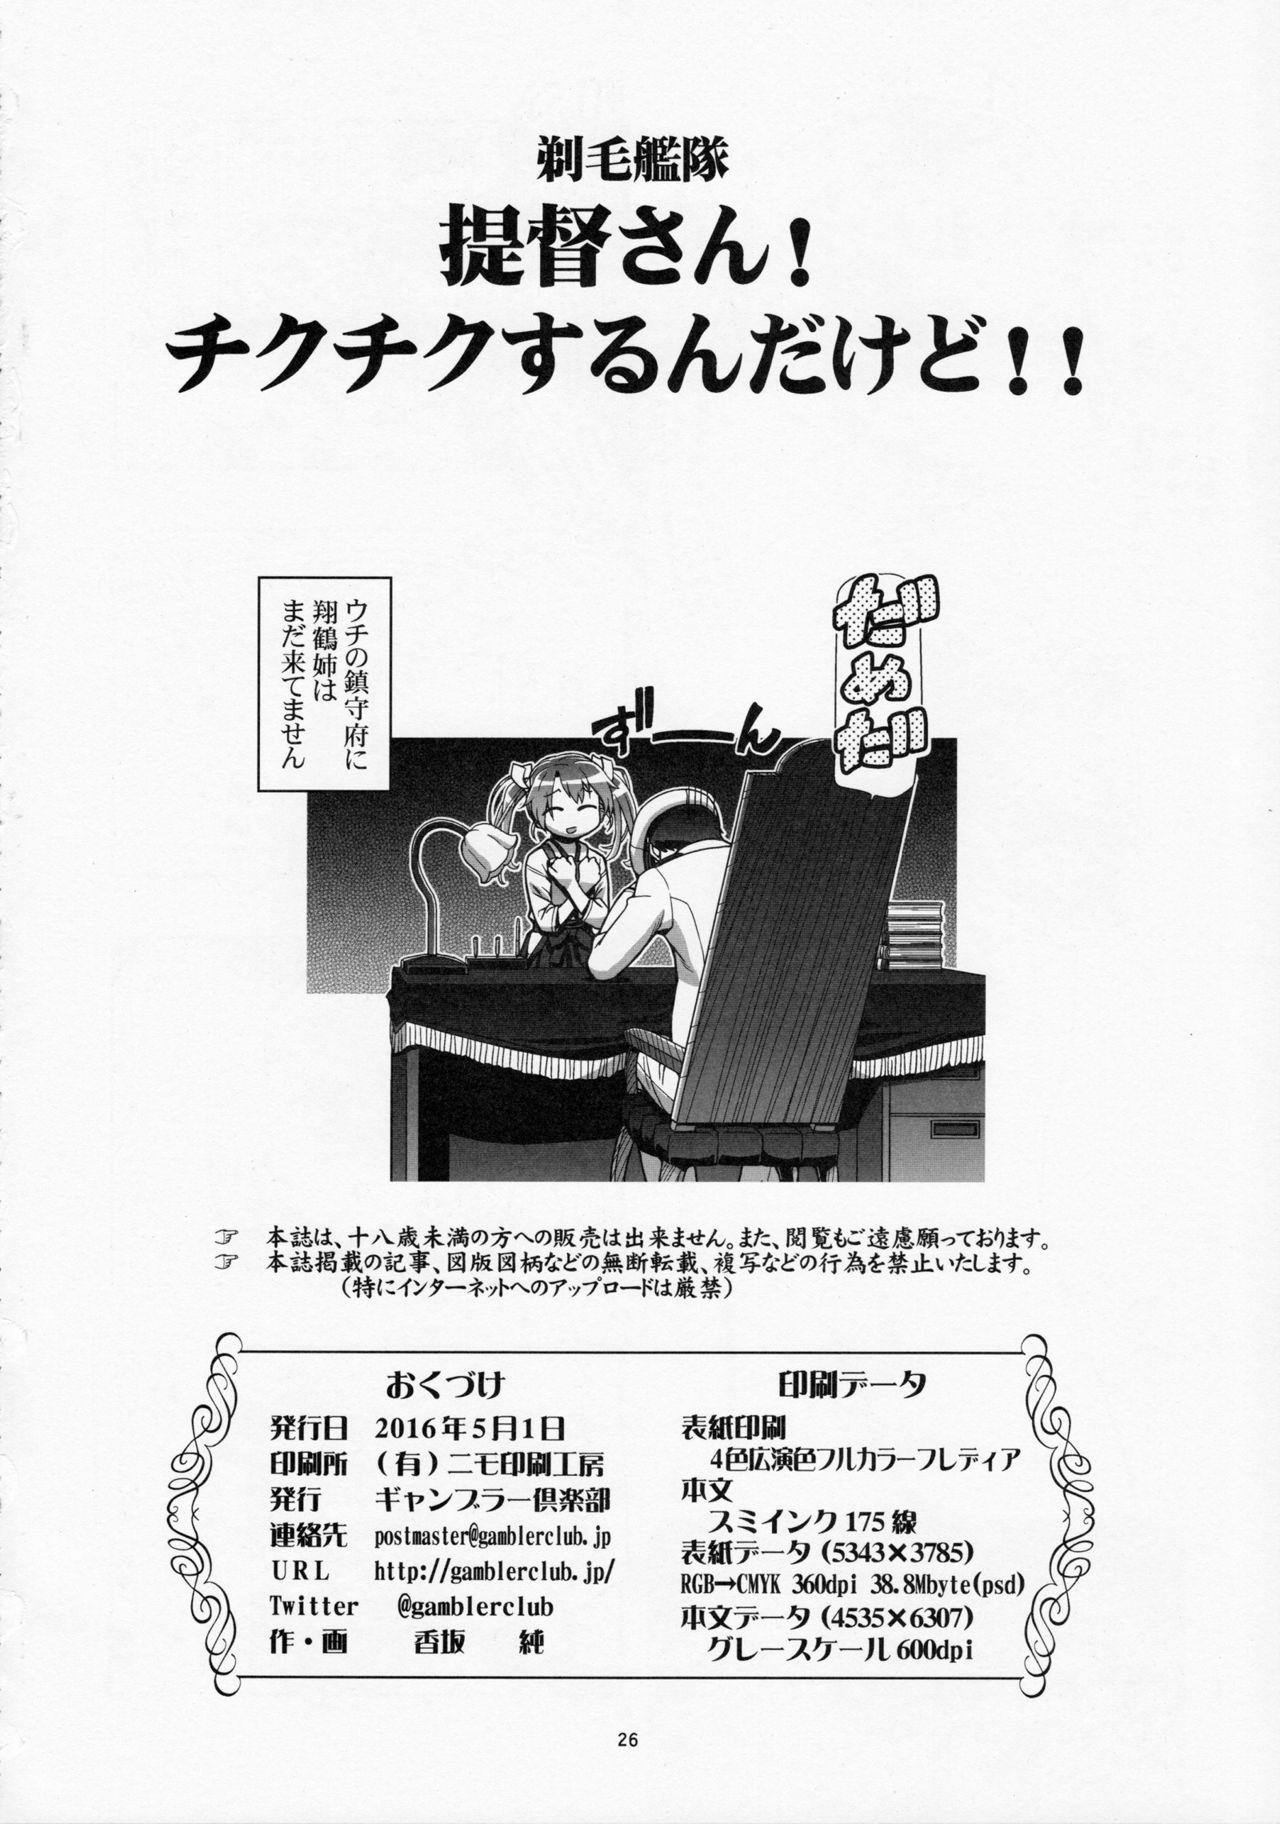 (COMIC1☆10) [Gambler Club (Kousaka Jun)] Teimou Kantai - Teitoku-san! Chikuchiku surun dakedo!! (Kantai Collection -KanColle-) 23